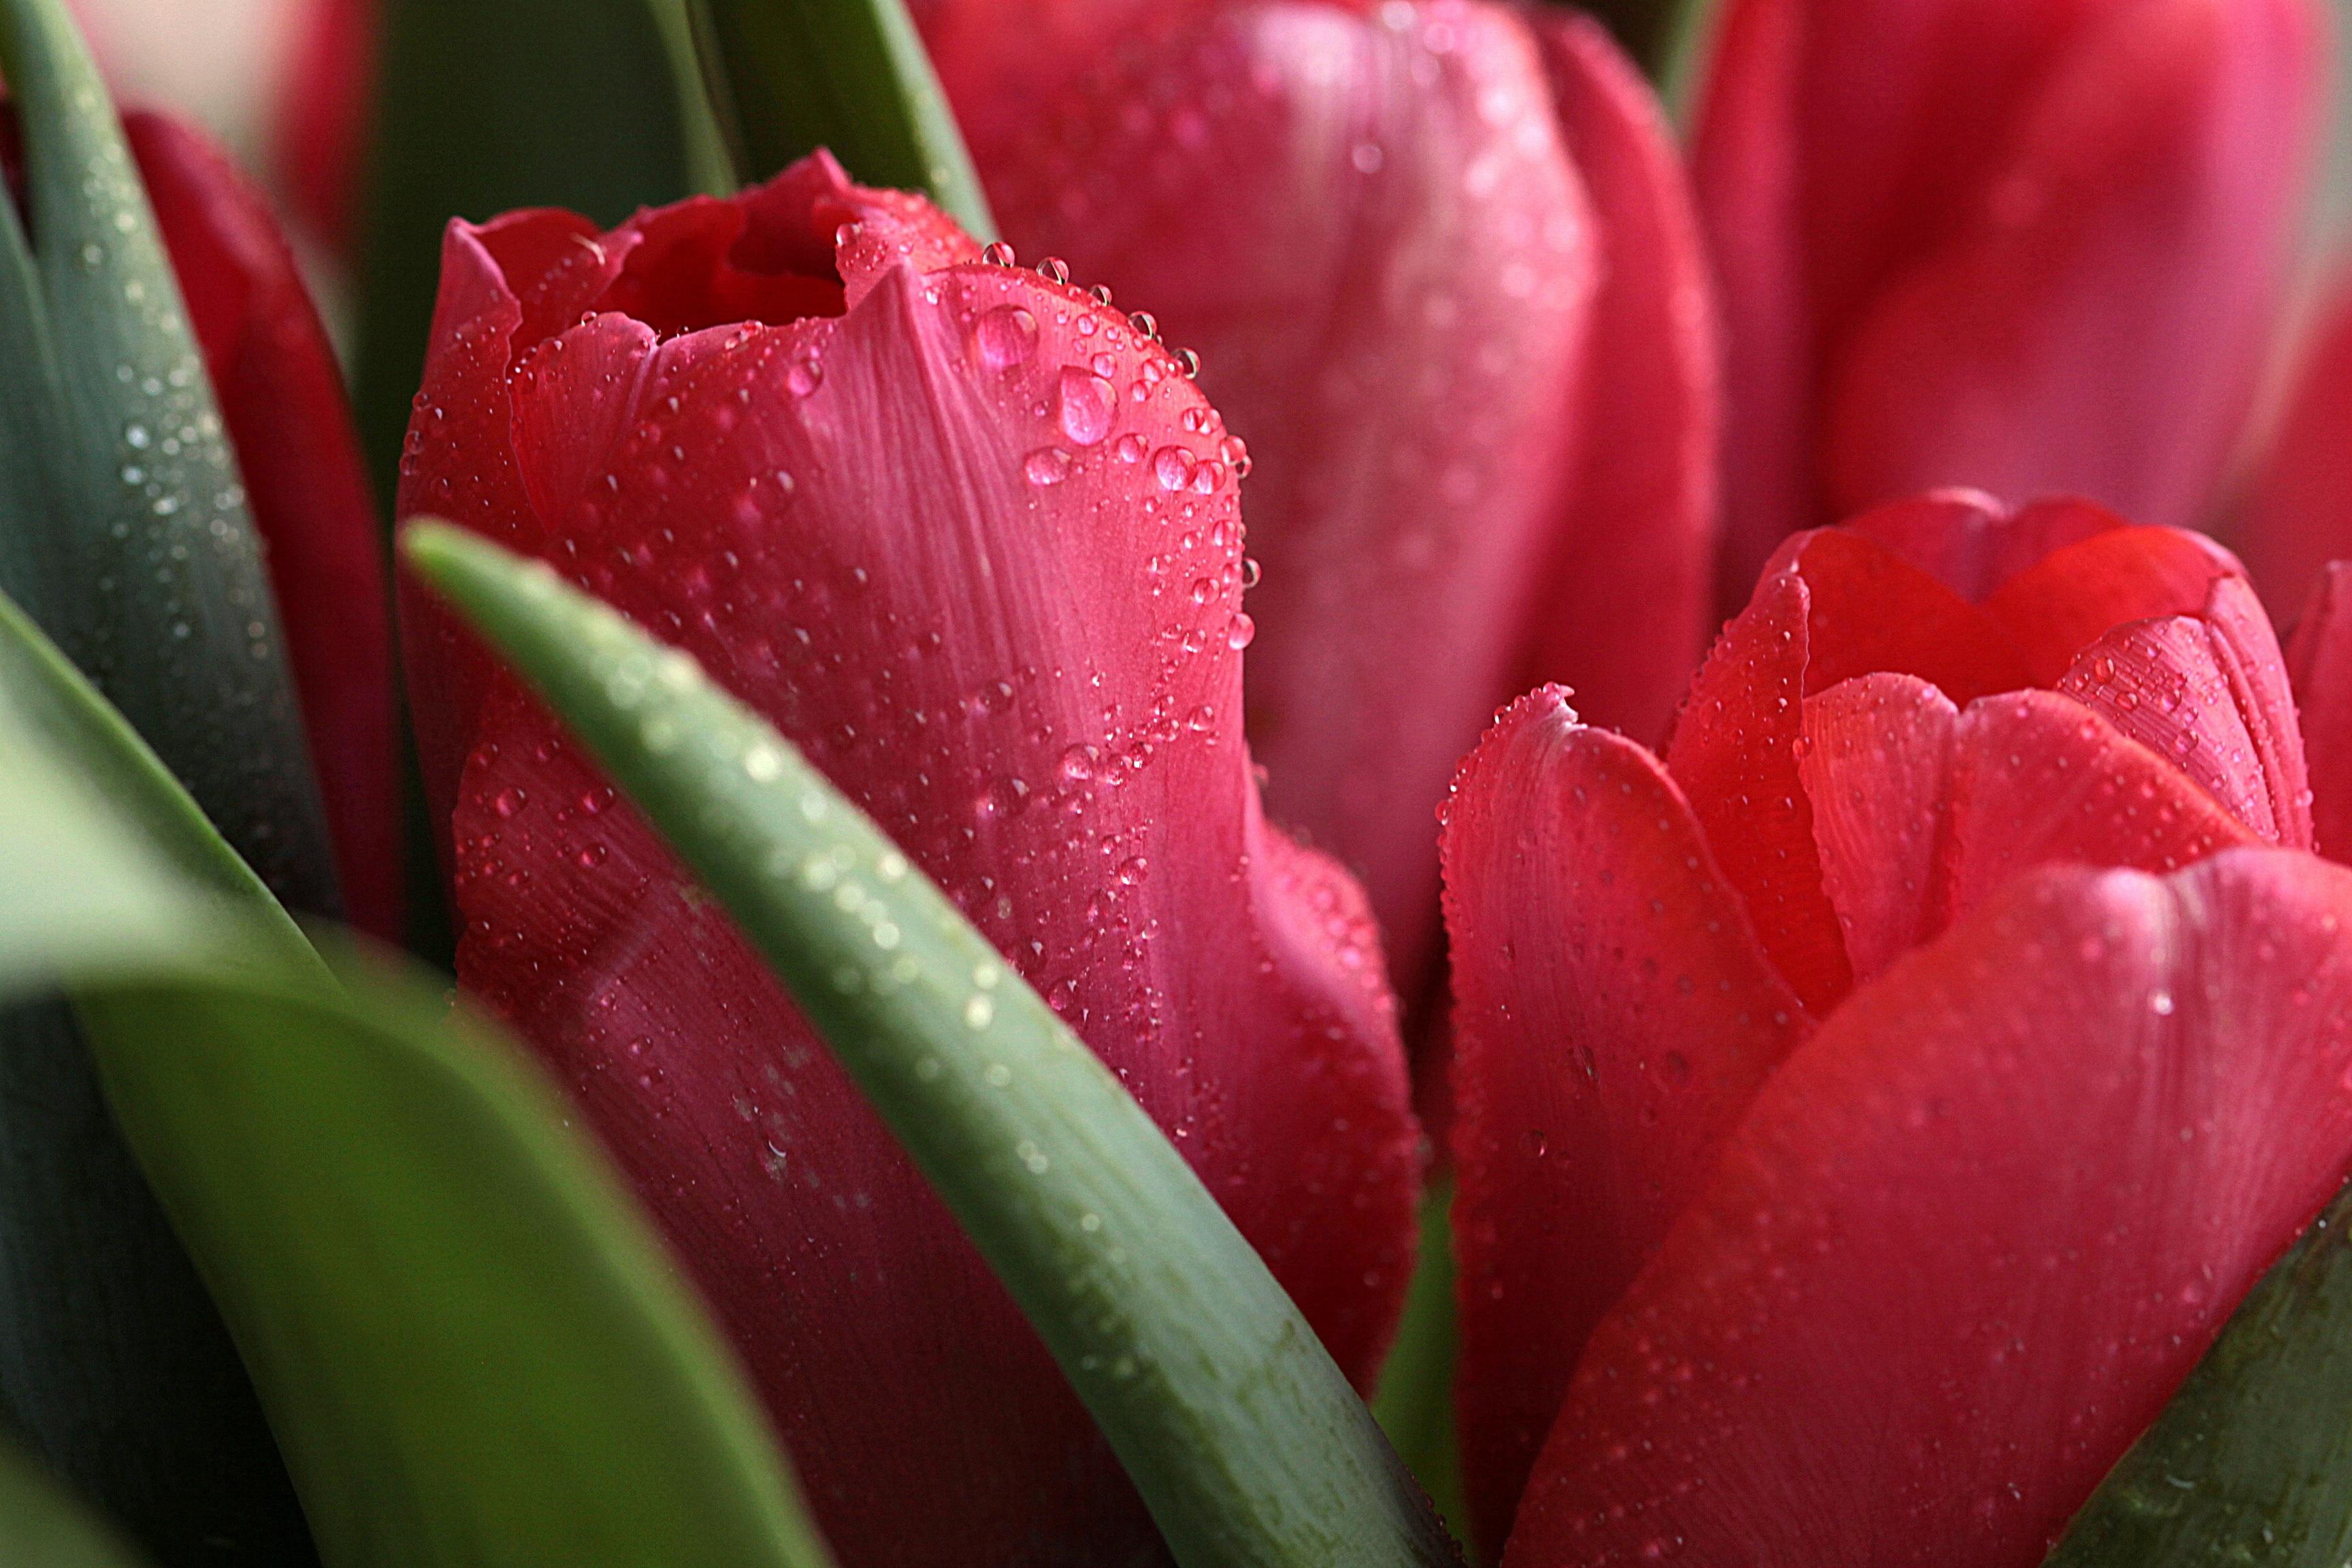 114317 descargar fondo de pantalla Macro, Planta, Drops, Cogollos, Brotes, Flores, Tulipanes: protectores de pantalla e imágenes gratis